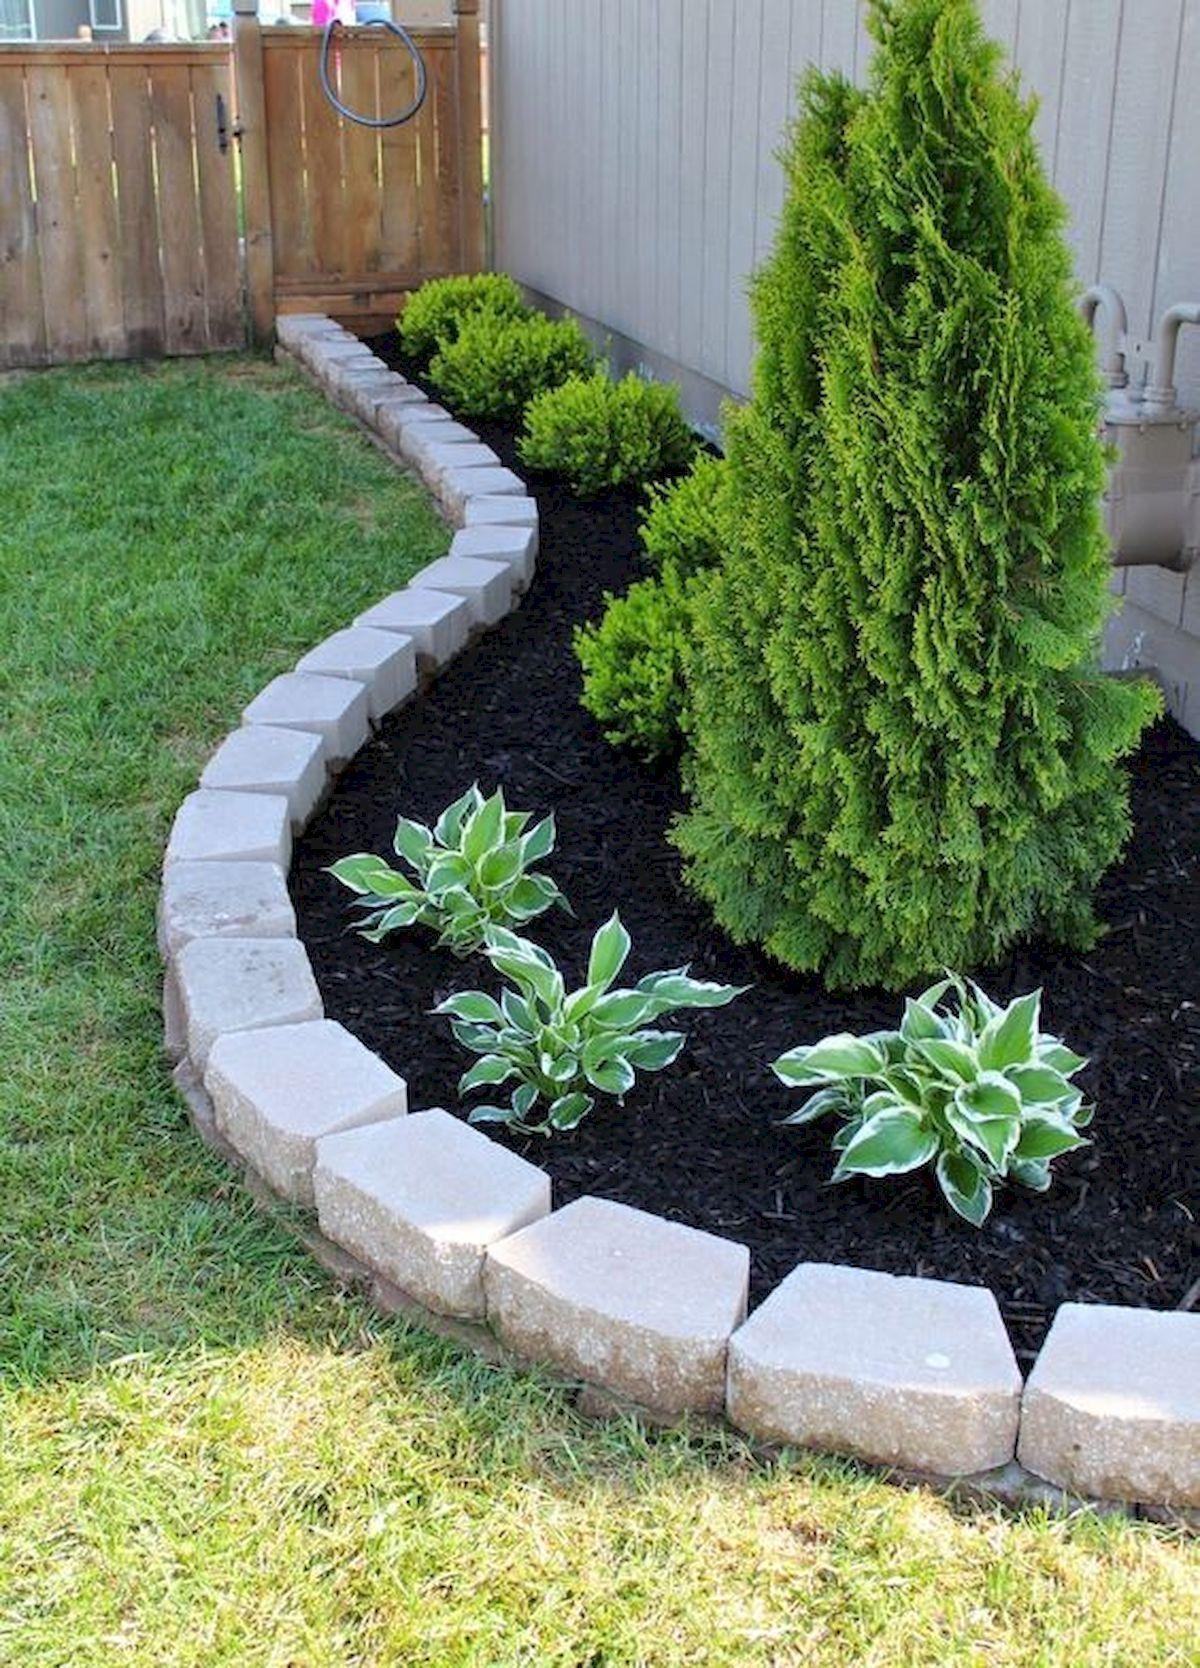 40 Beautiful Garden Decorating Ideas The Right Garden Decor